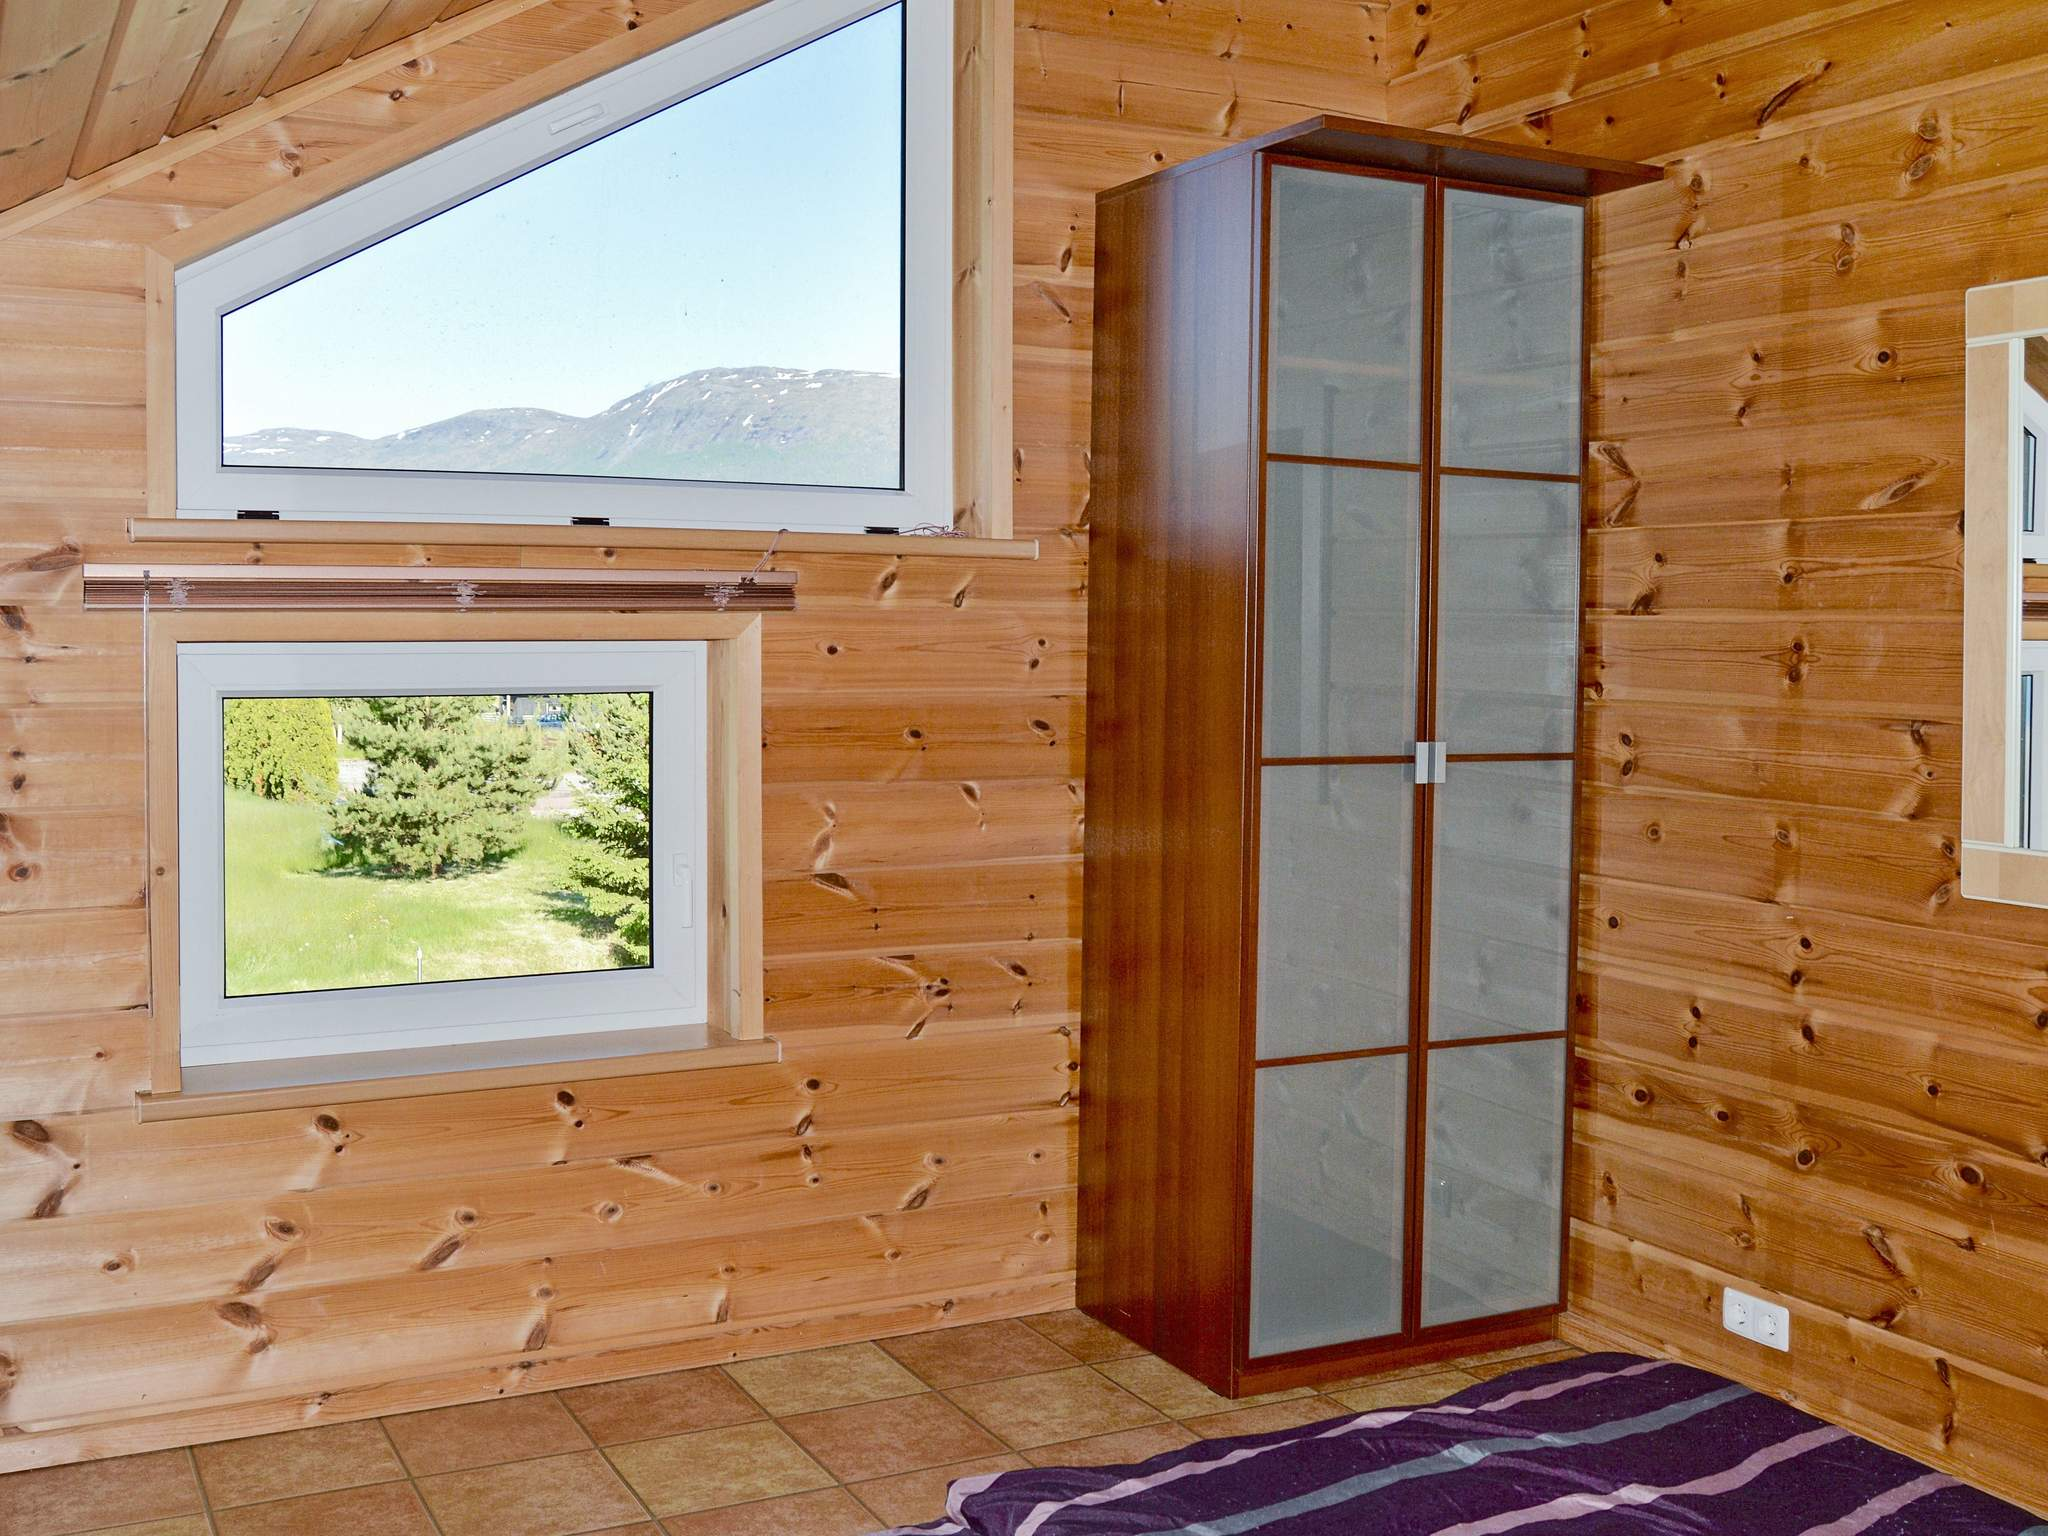 Ferienhaus Eidsvåg (135541), Eidsvåg, More - Romsdal, Westnorwegen, Norwegen, Bild 18